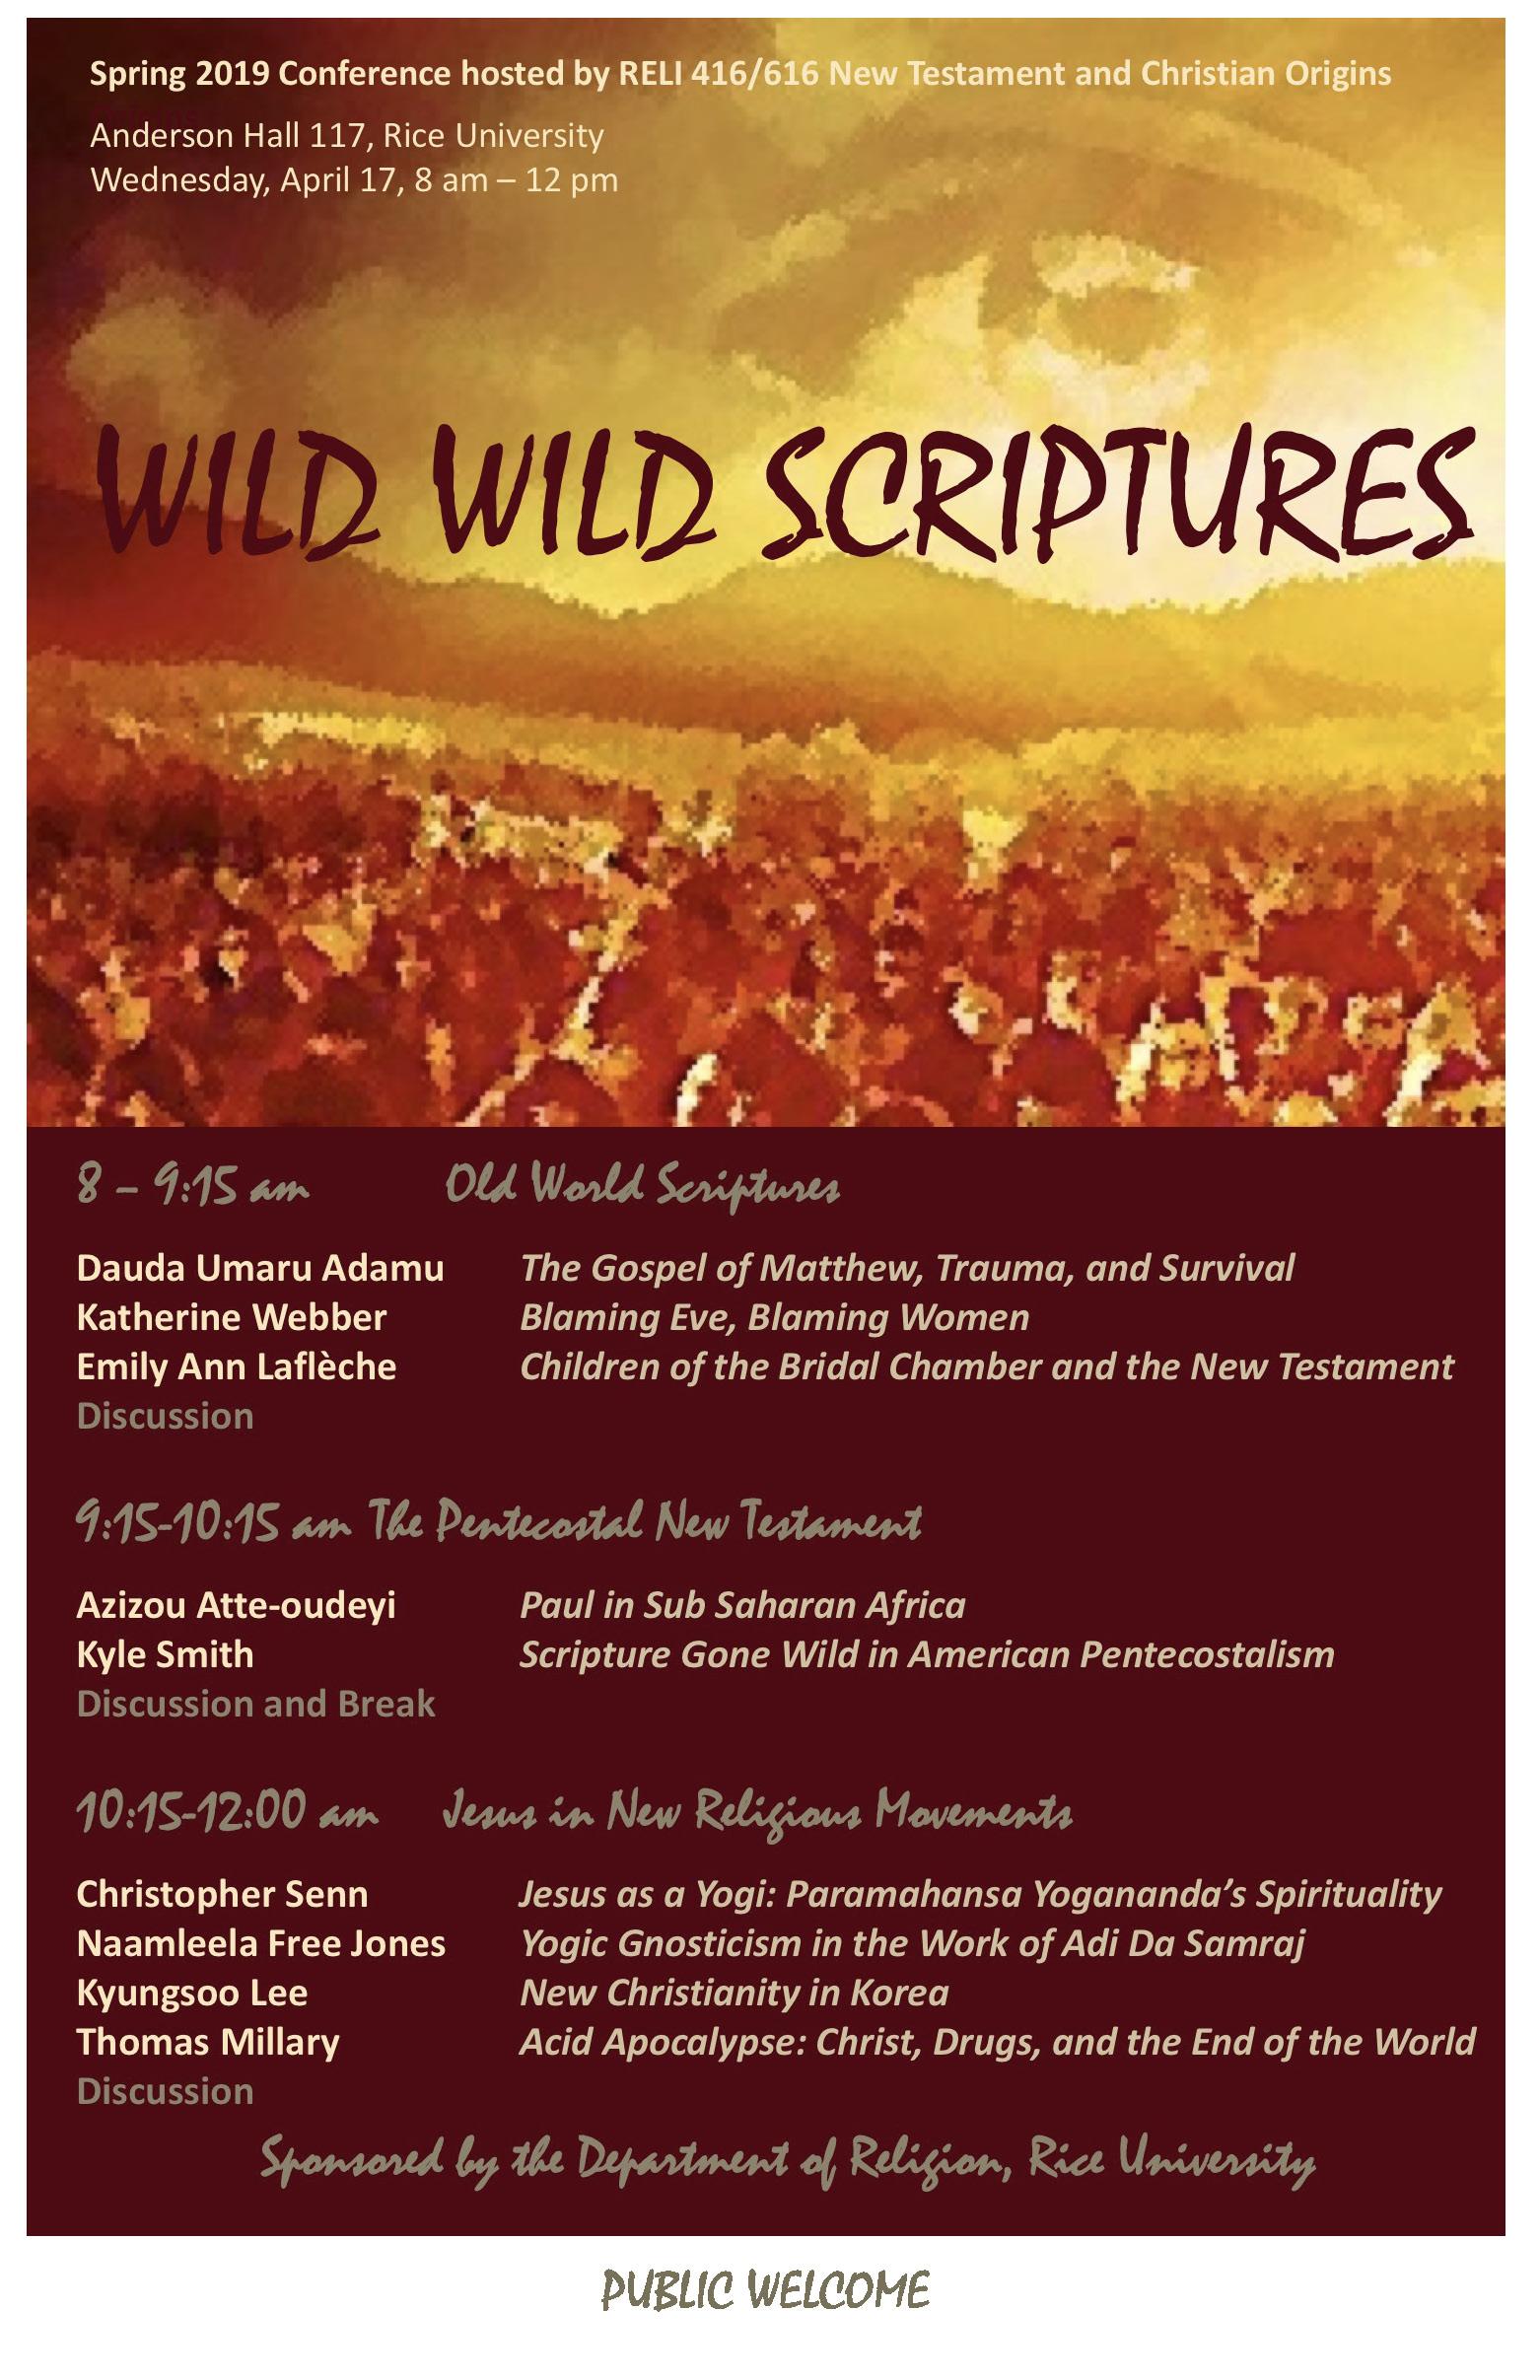 Wild Wild Scriptures 2019.jpg